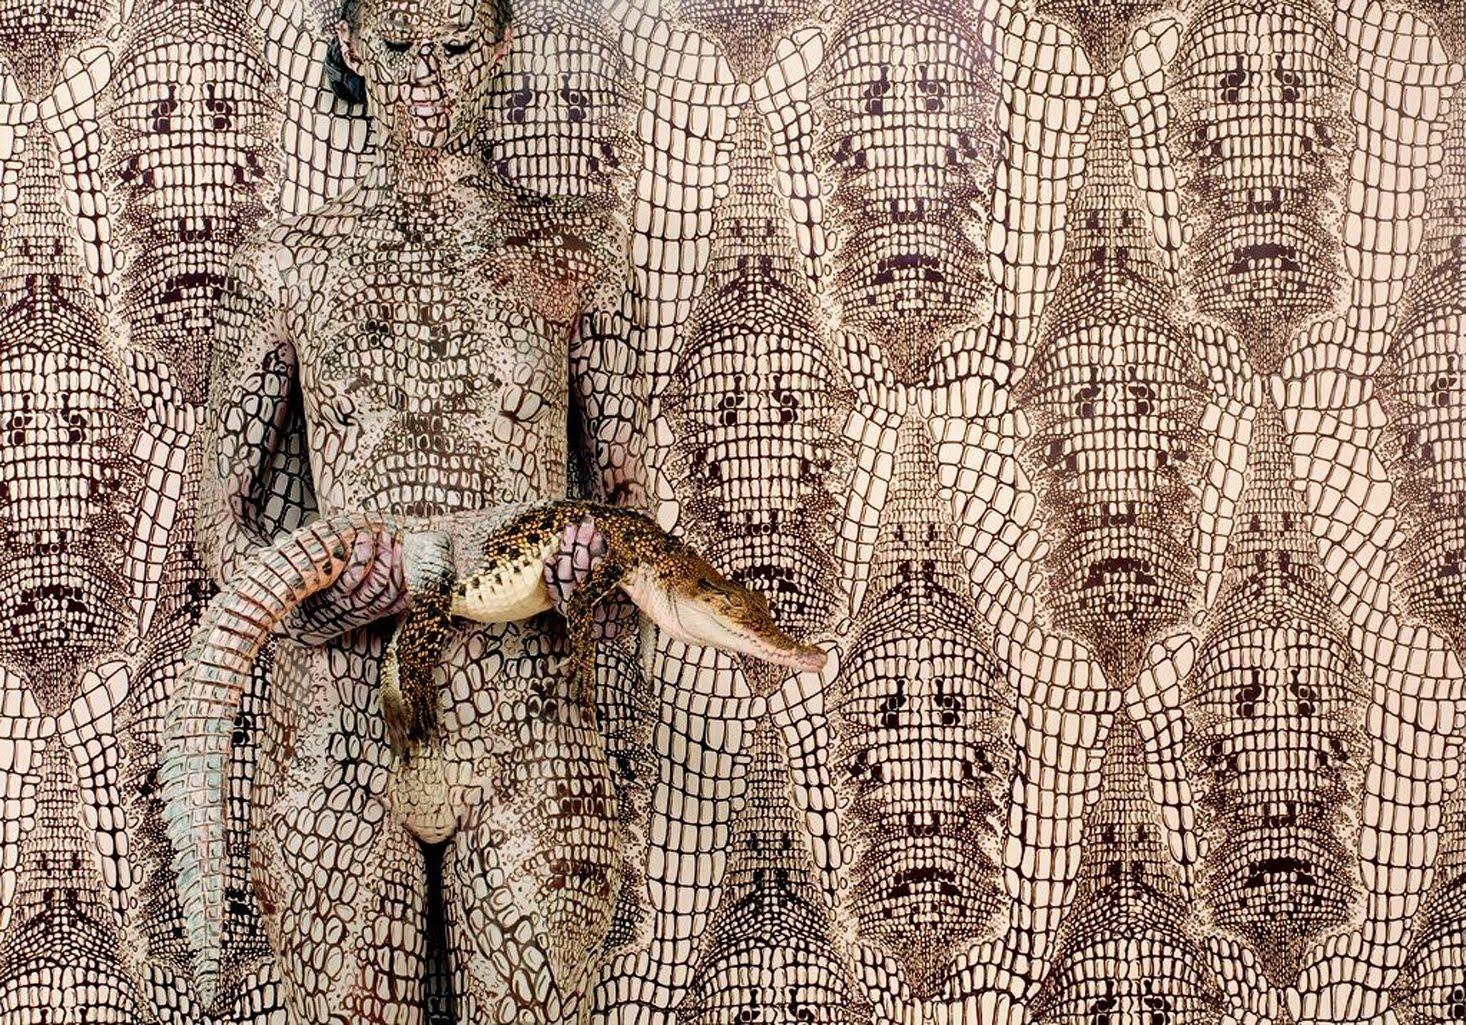 Naked Woman Illusion 69